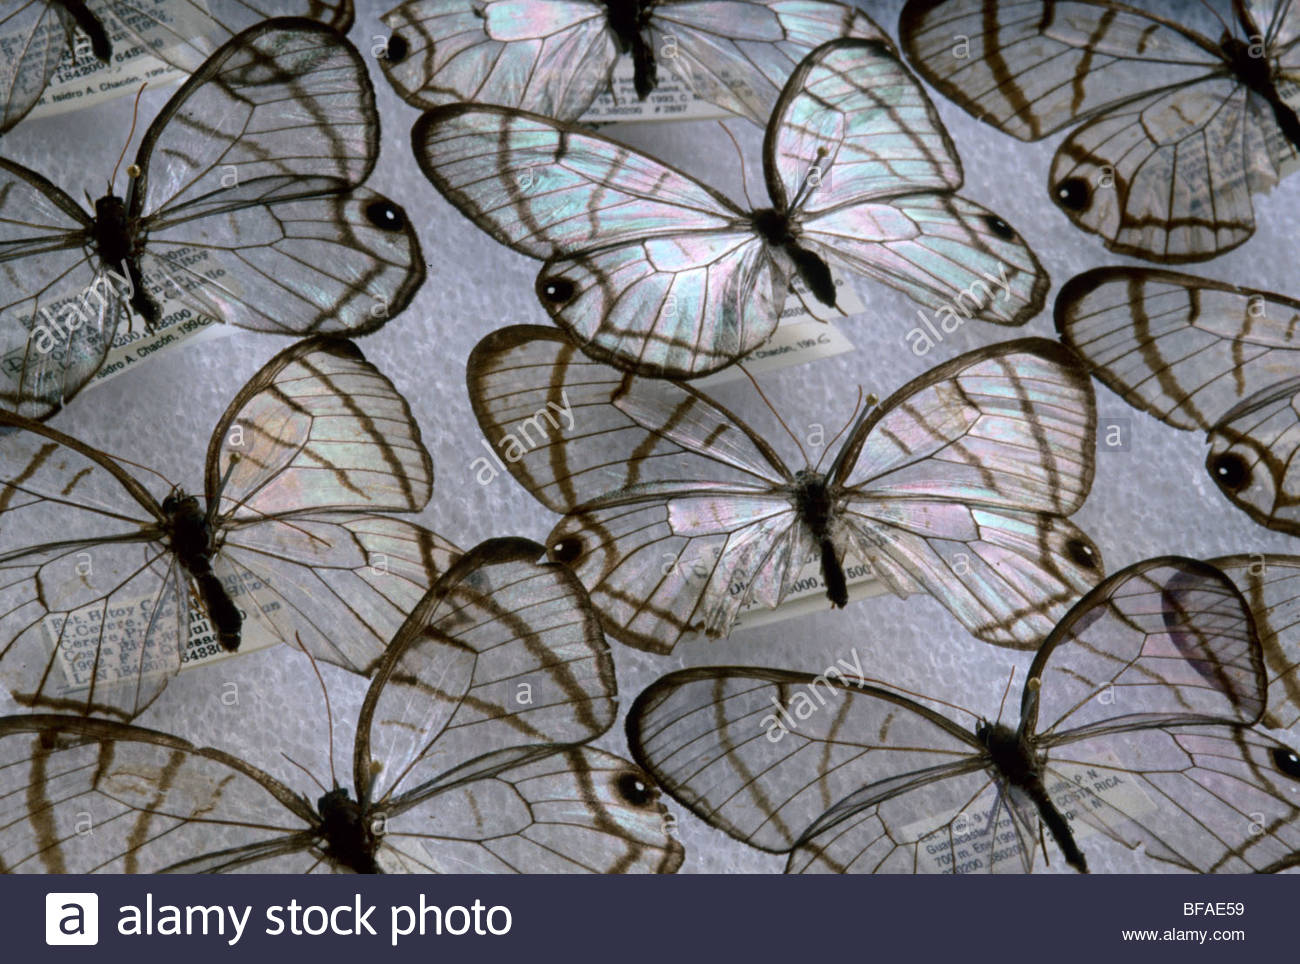 Glass wing butterflies, Dulcedo polita, National Institute of Biodiversity, Costa Rica - Stock Image